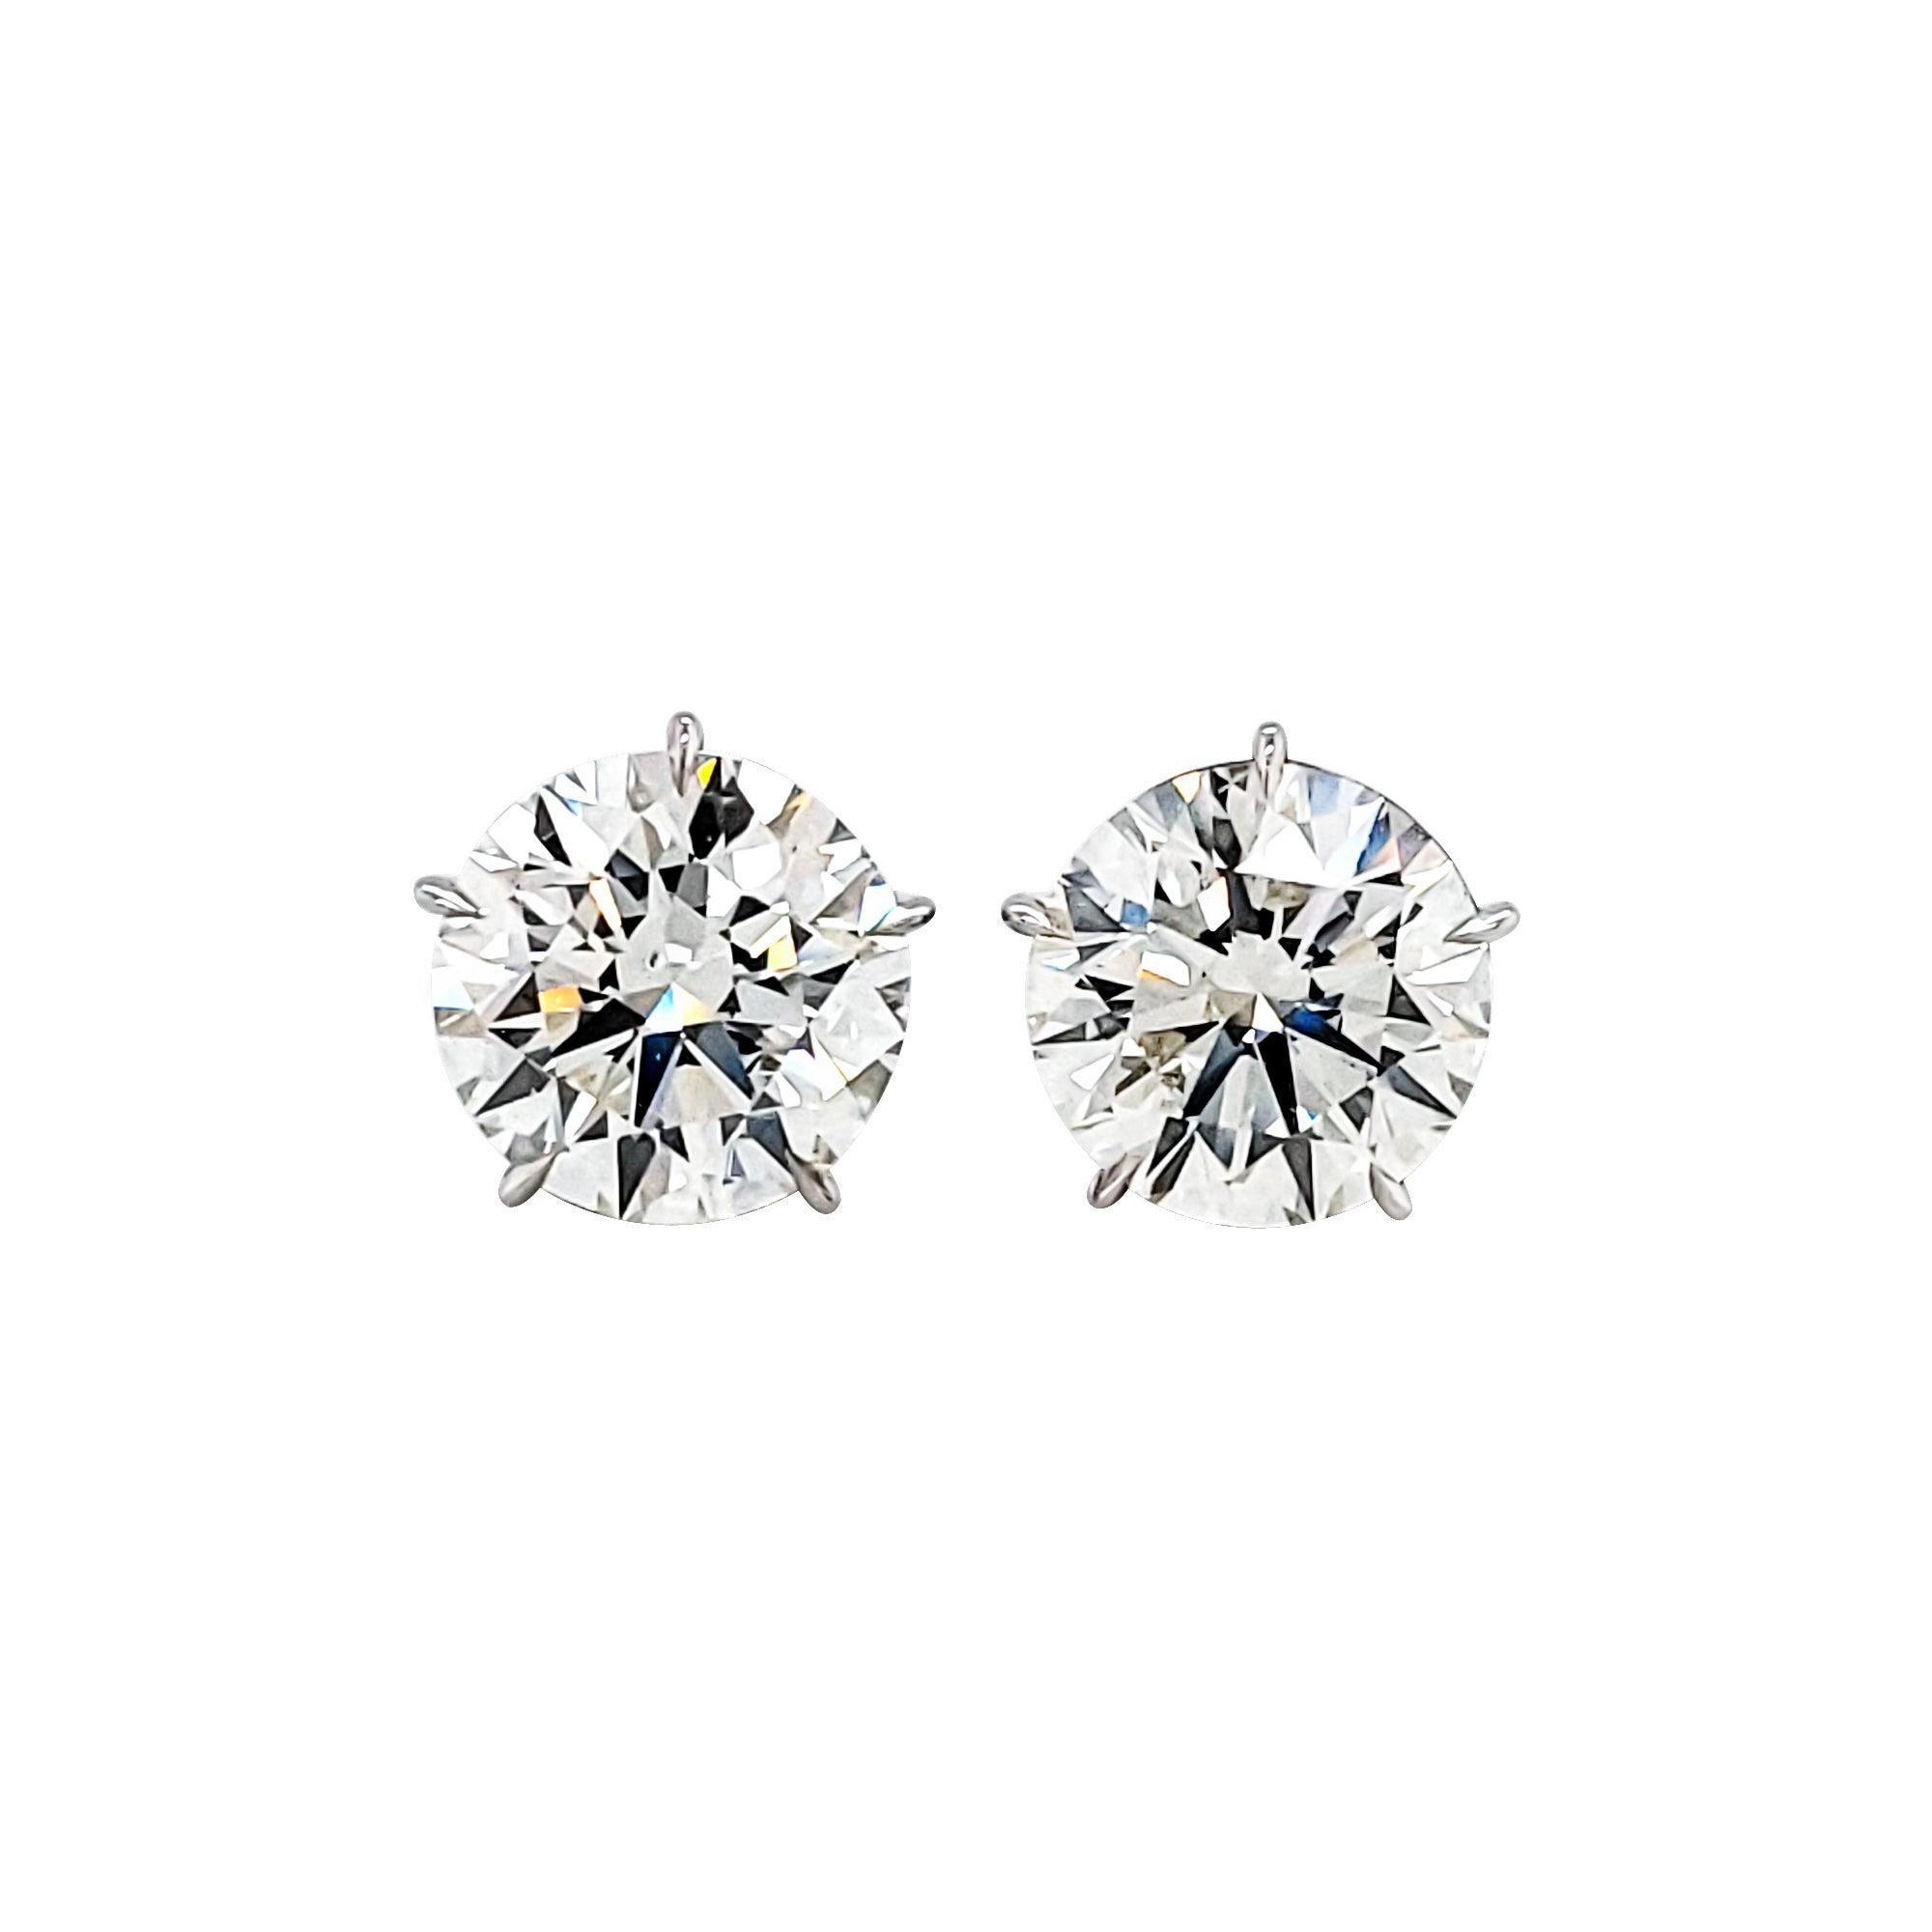 GIA Certified 2.20 & 2.32 Carat J Color Round Diamond Earrings